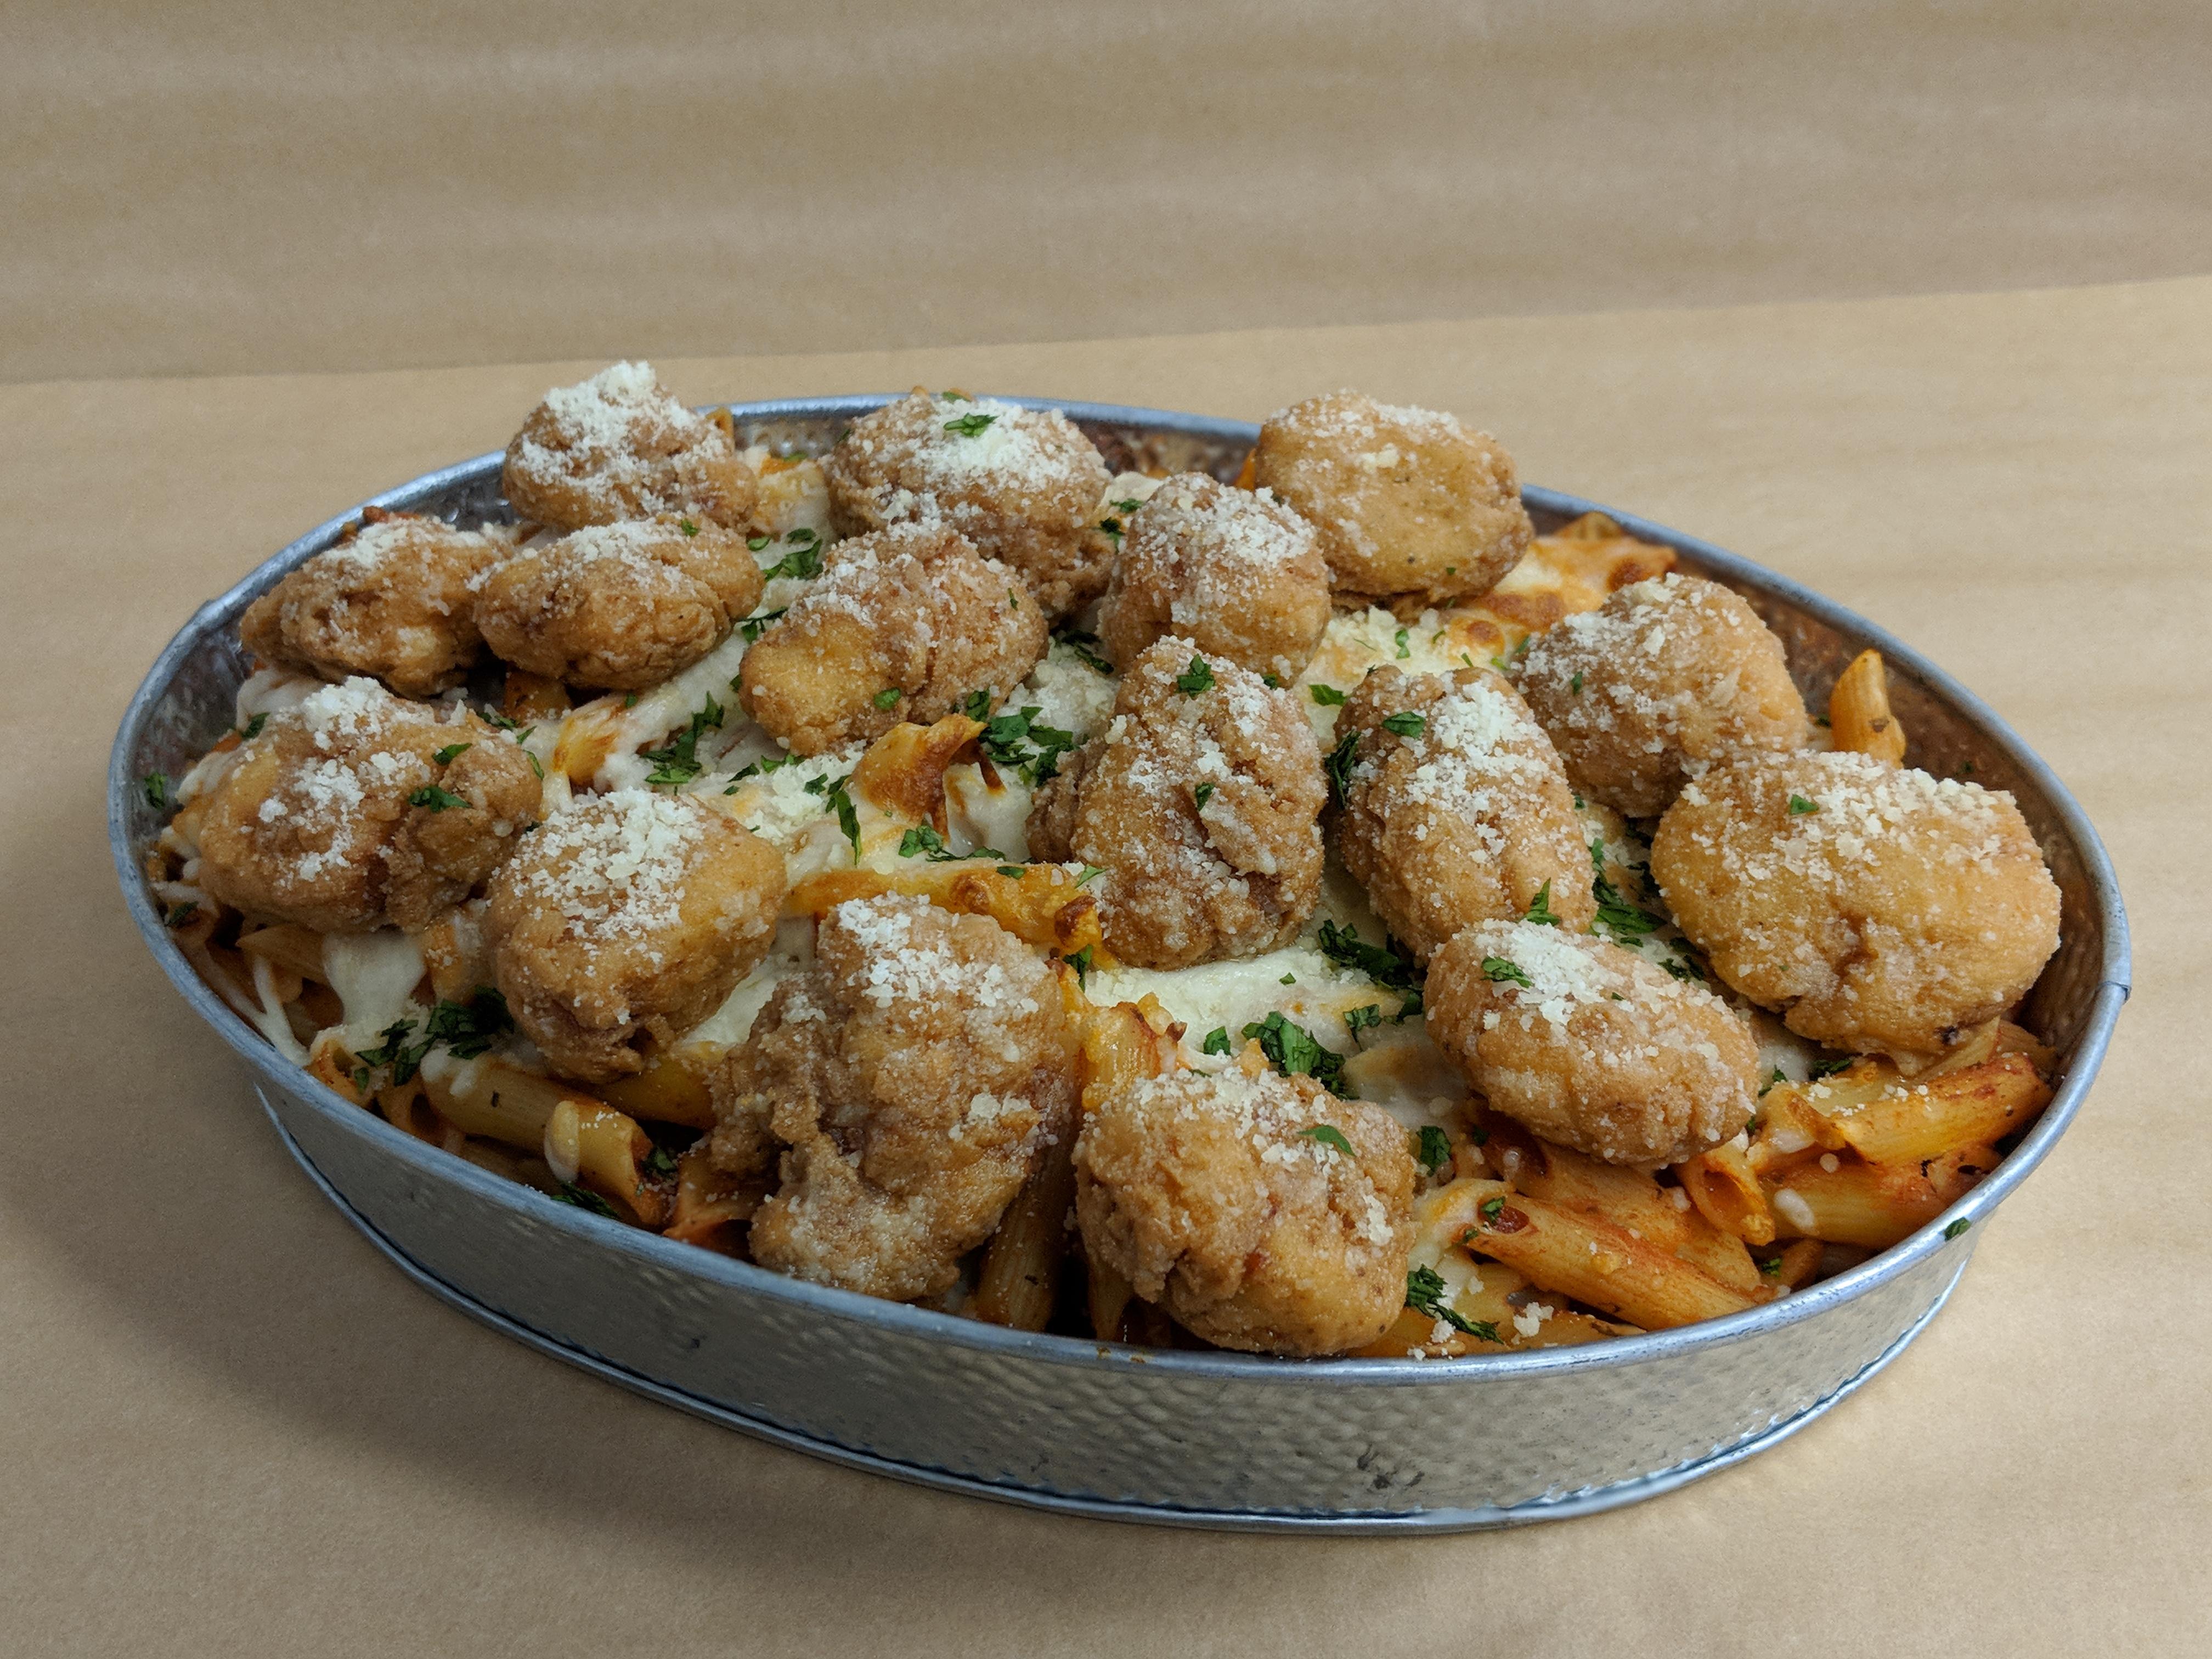 Garlic Parmesan Pasta   Wreck Your Breath Its Worth It   WINGSIDER 4032x3024